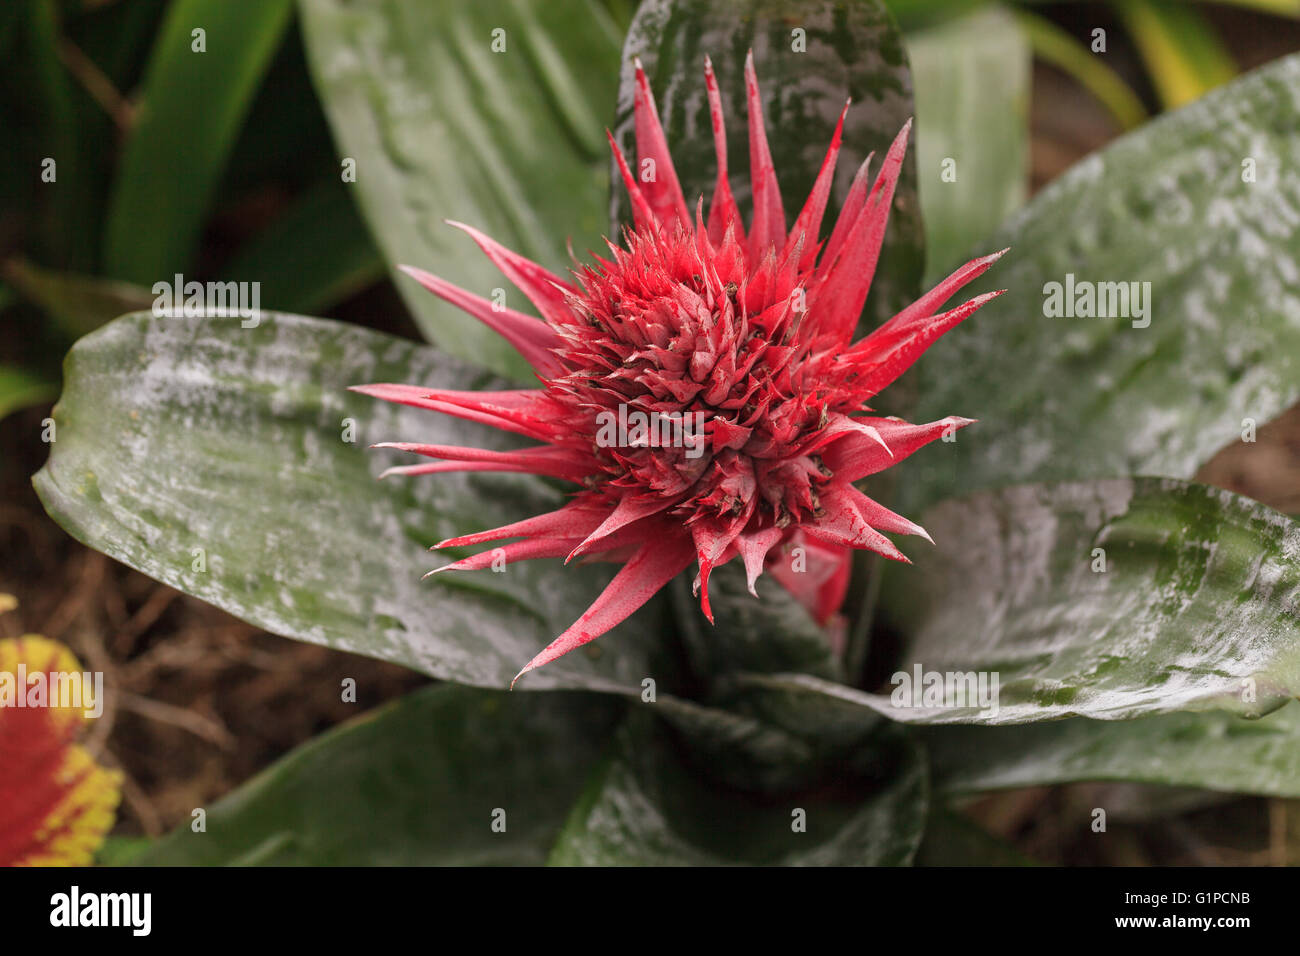 Pink bromeliad flower aechmea fasciata is a beautiful but poisonous pink bromeliad flower aechmea fasciata is a beautiful but poisonous plant found in brazil mightylinksfo